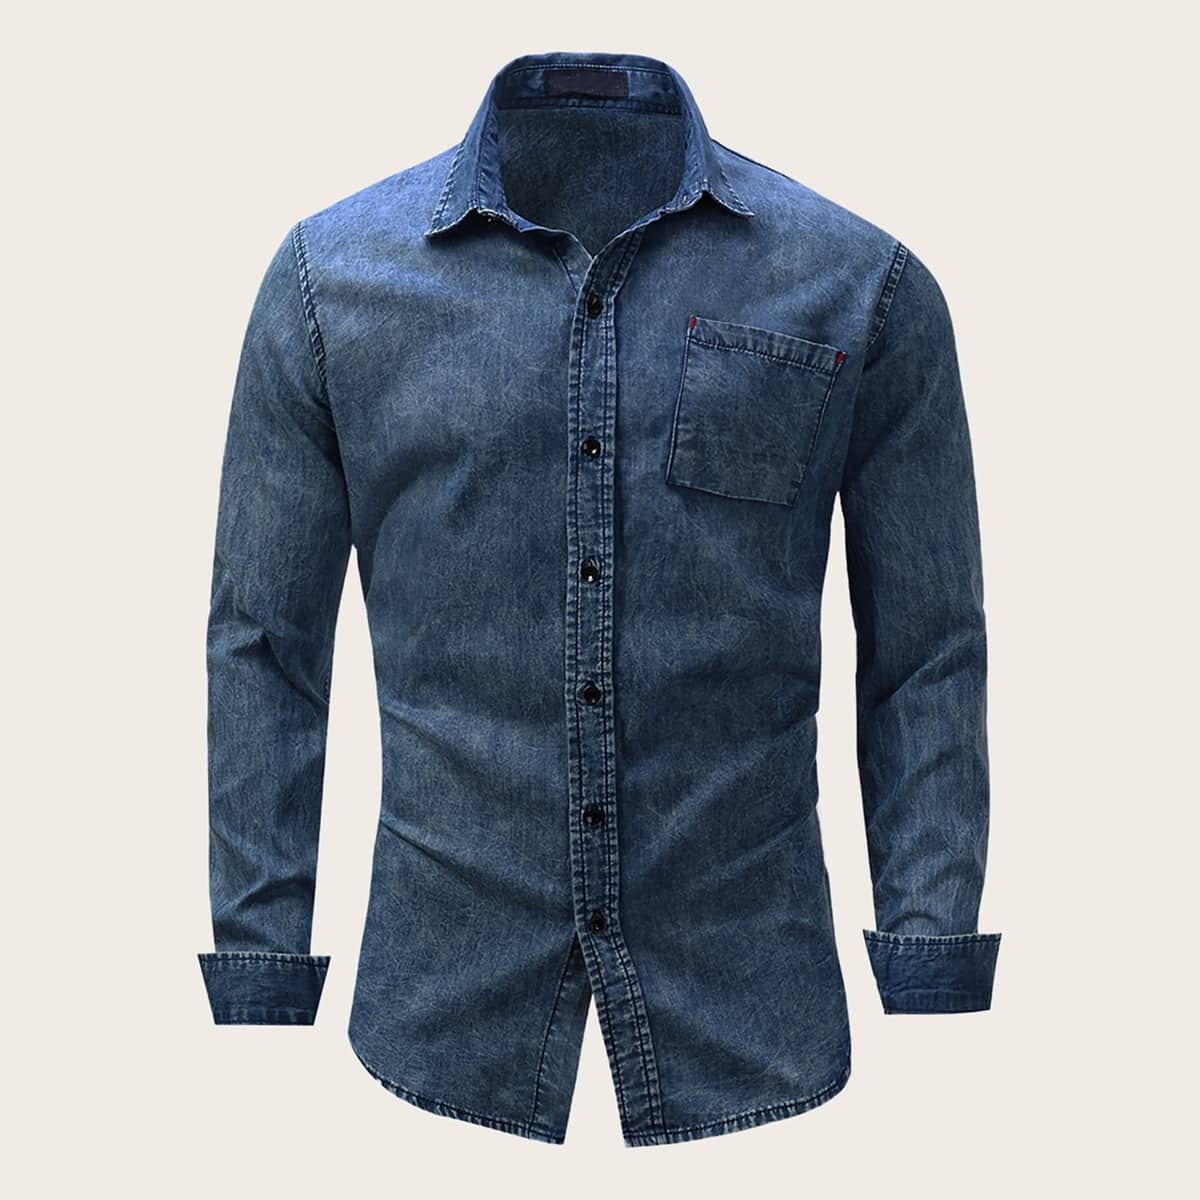 Marine Casual Heren Jeans overhemden Zak